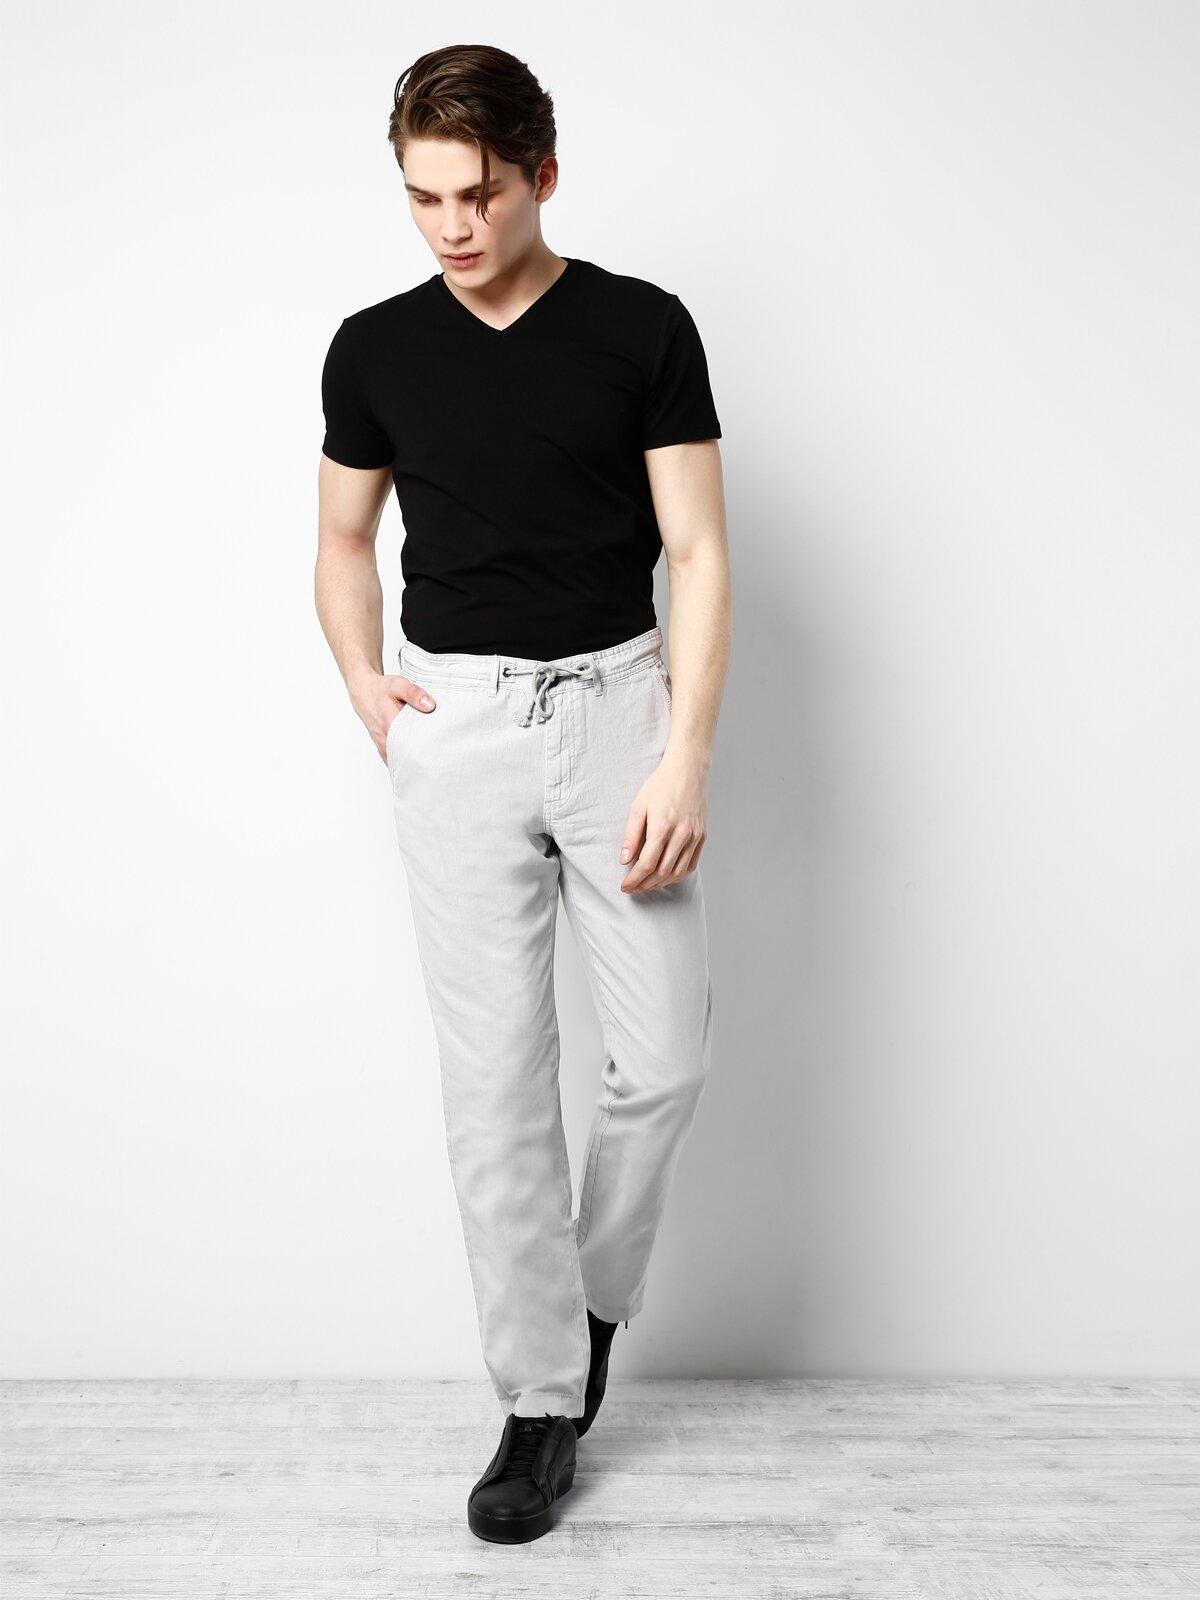 Siyah V Yaka Kısa Kol Tişört